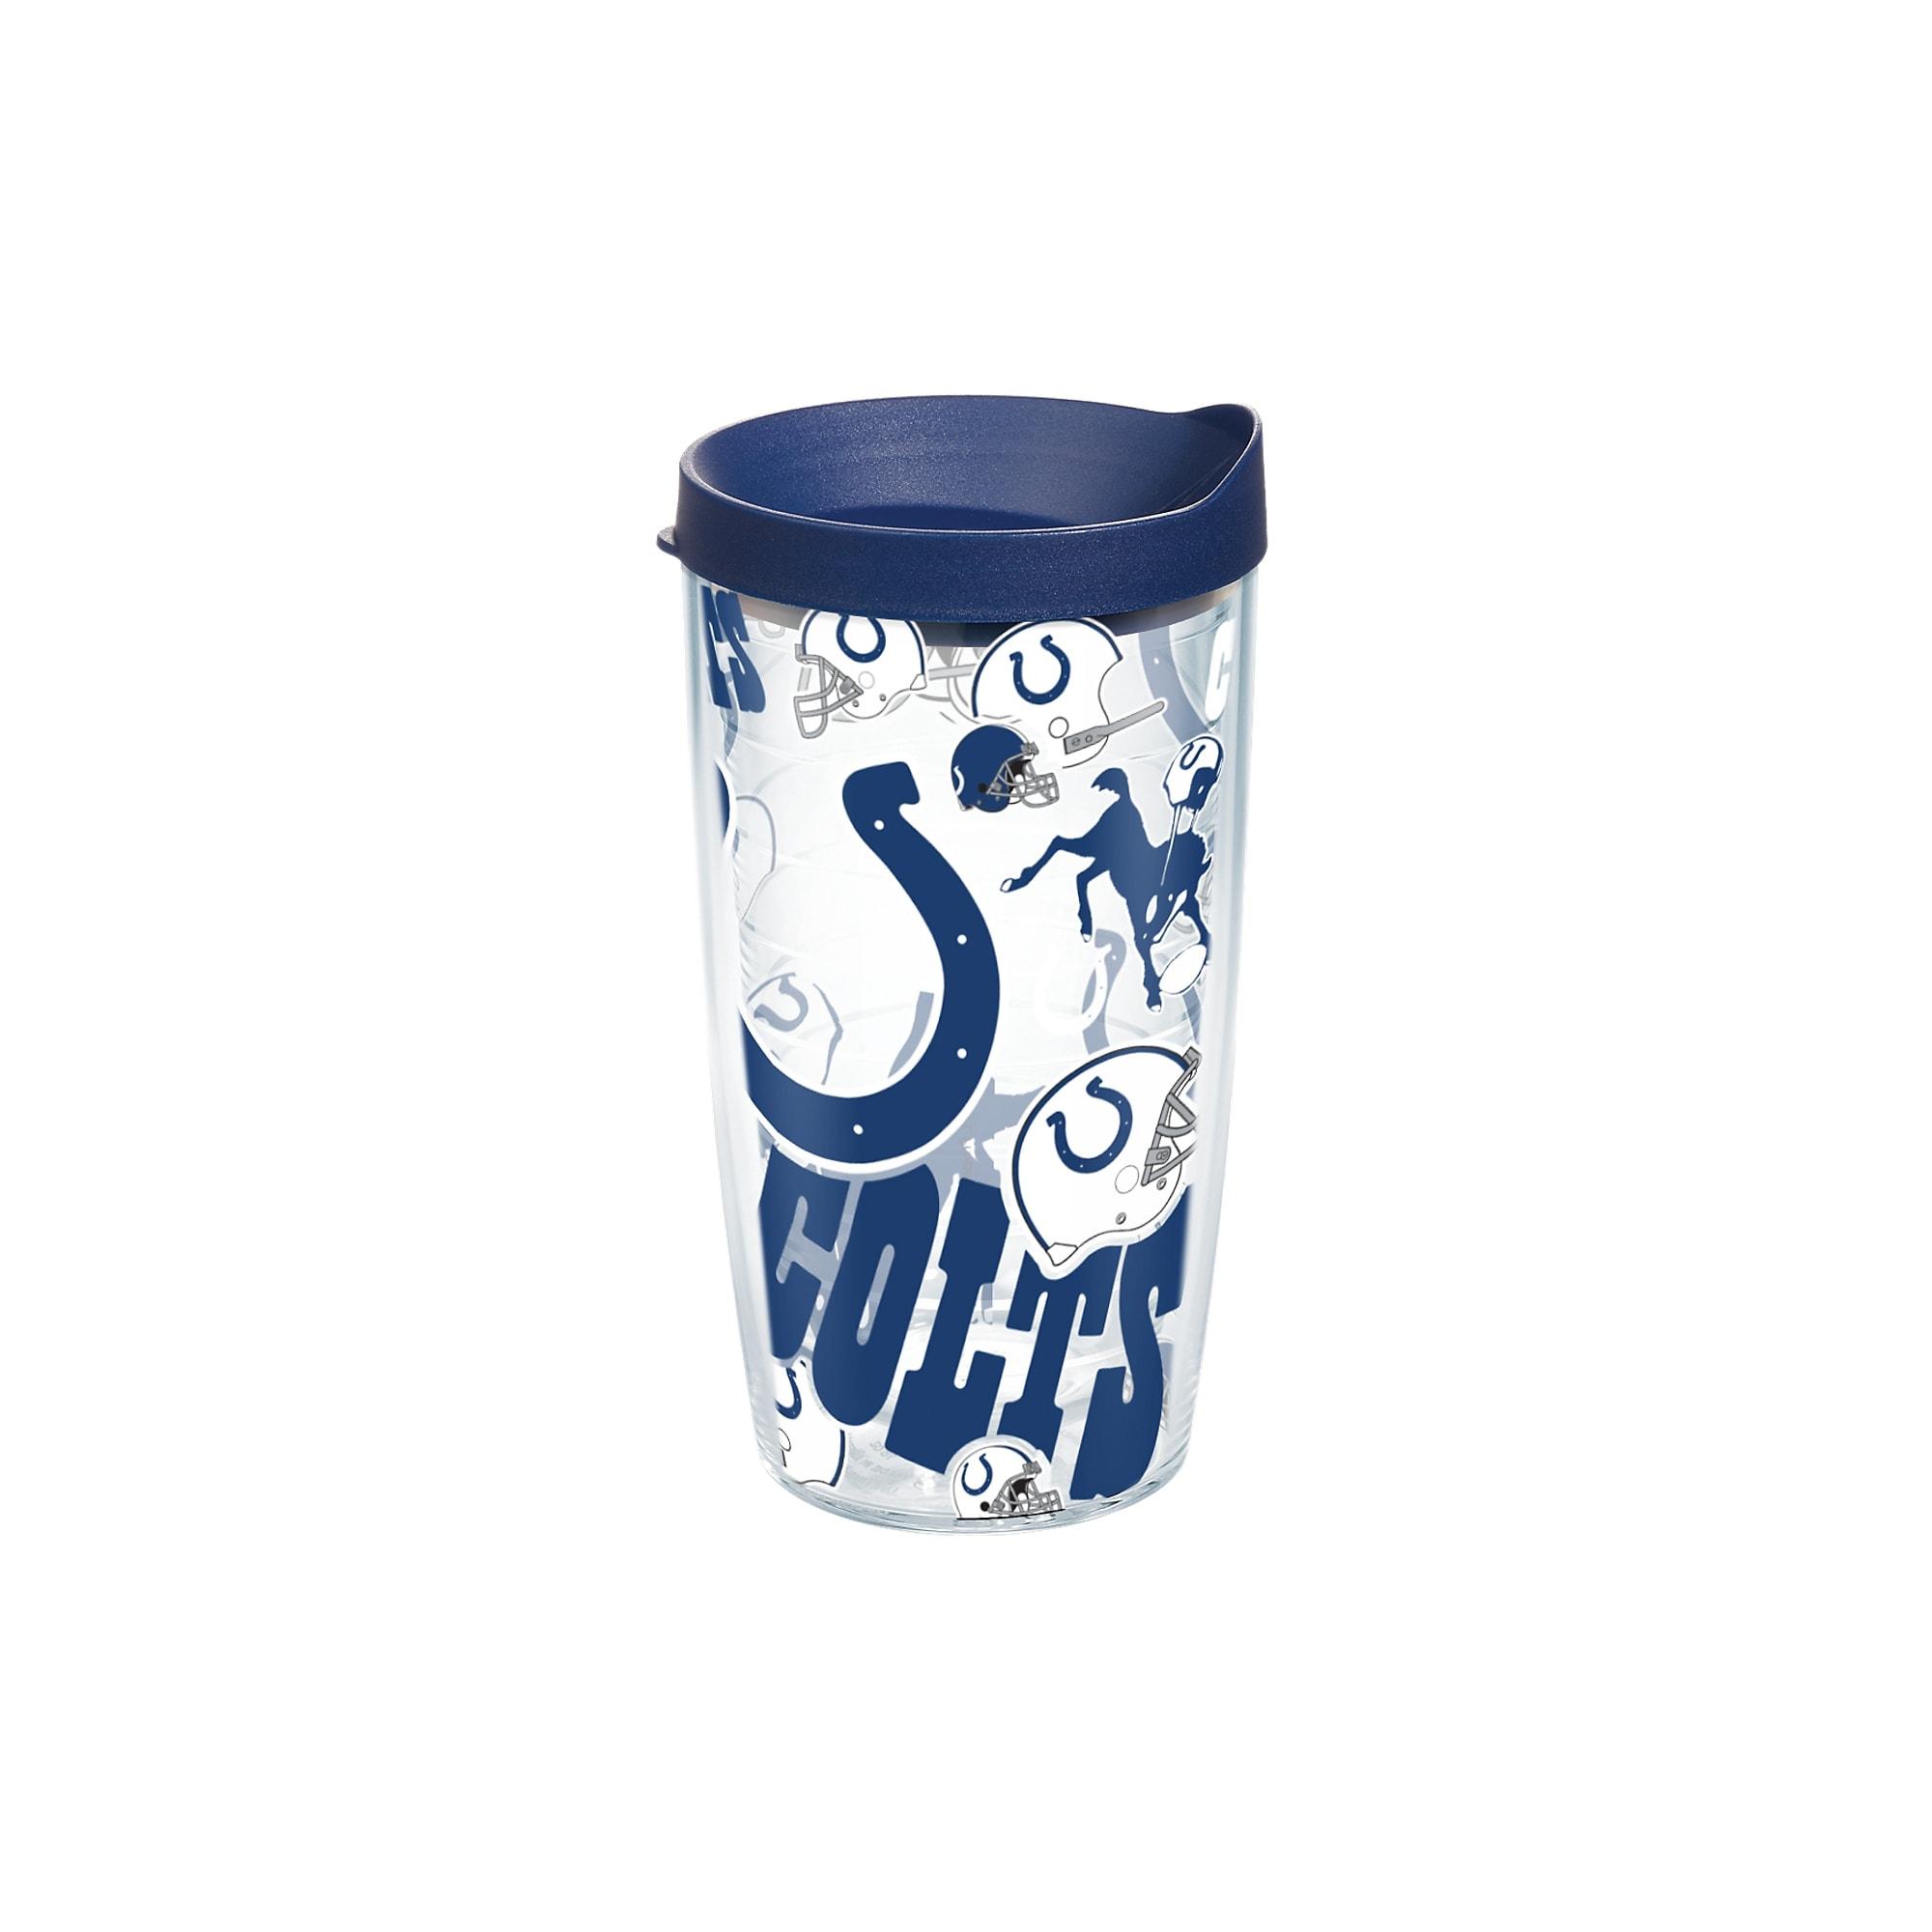 24-16 oz Indianapolis Colts Reusable Plastic Cups